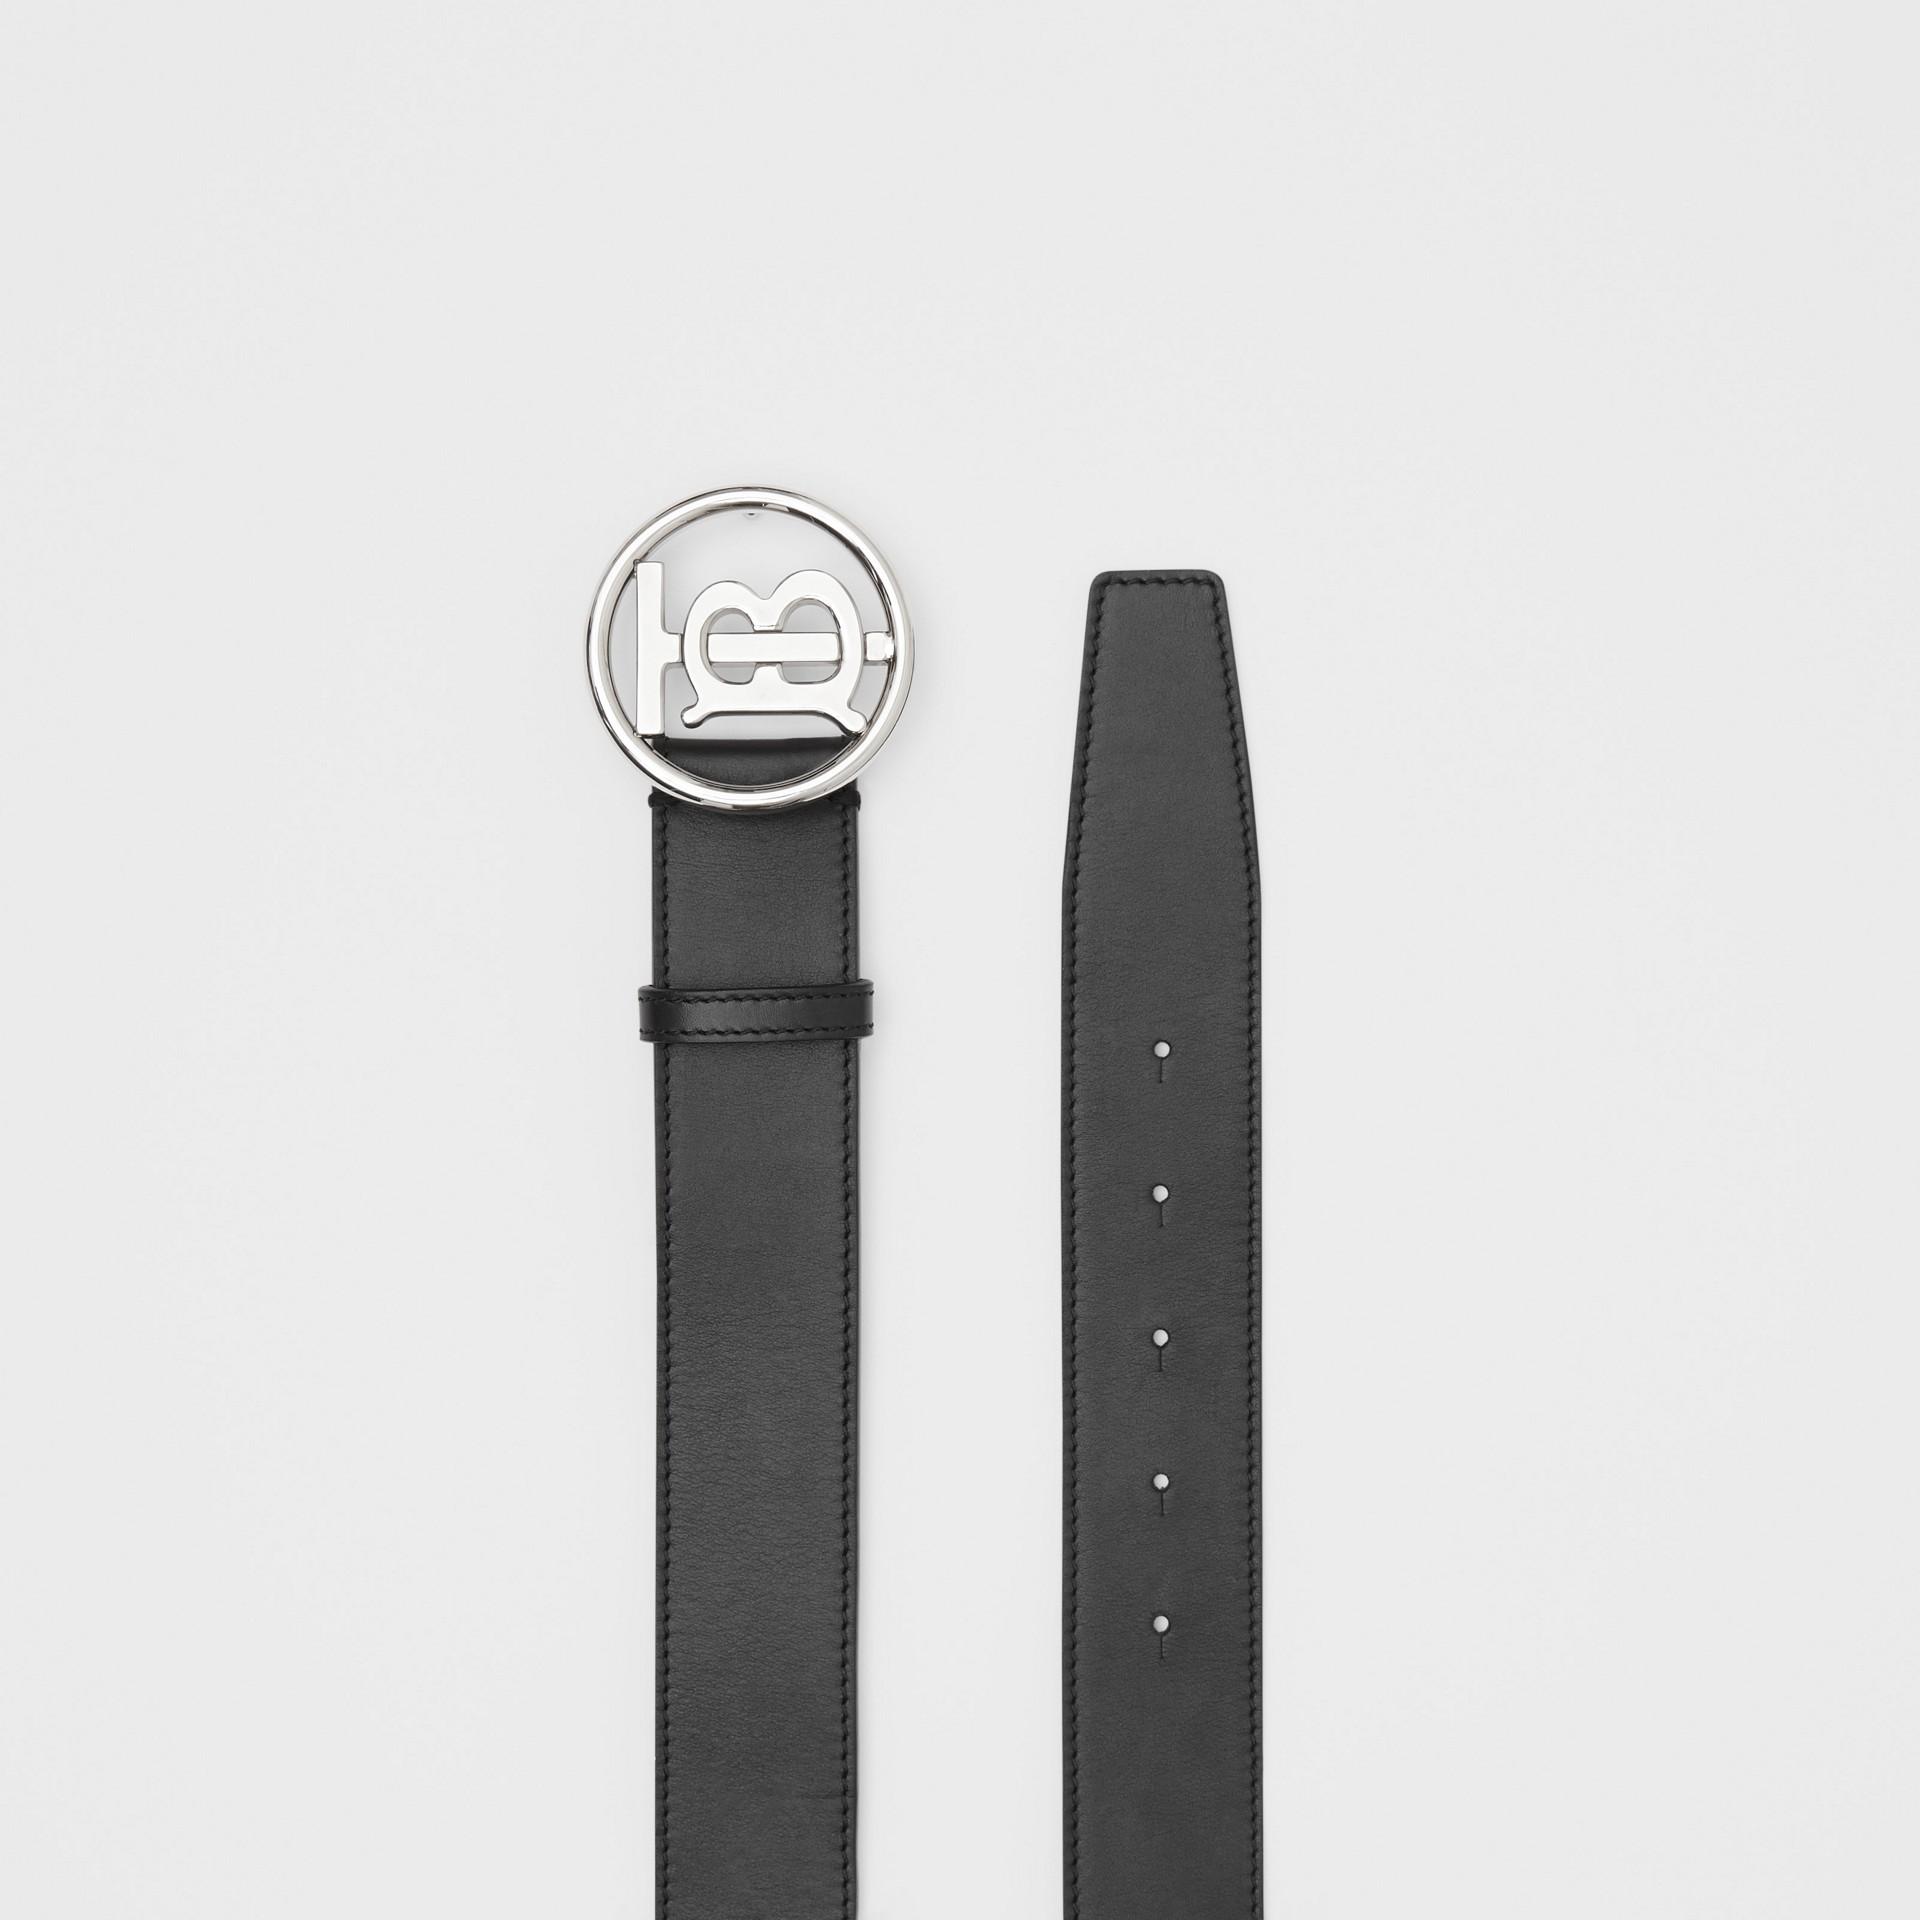 Monogram Motif Leather Belt in Black - Men | Burberry - gallery image 4